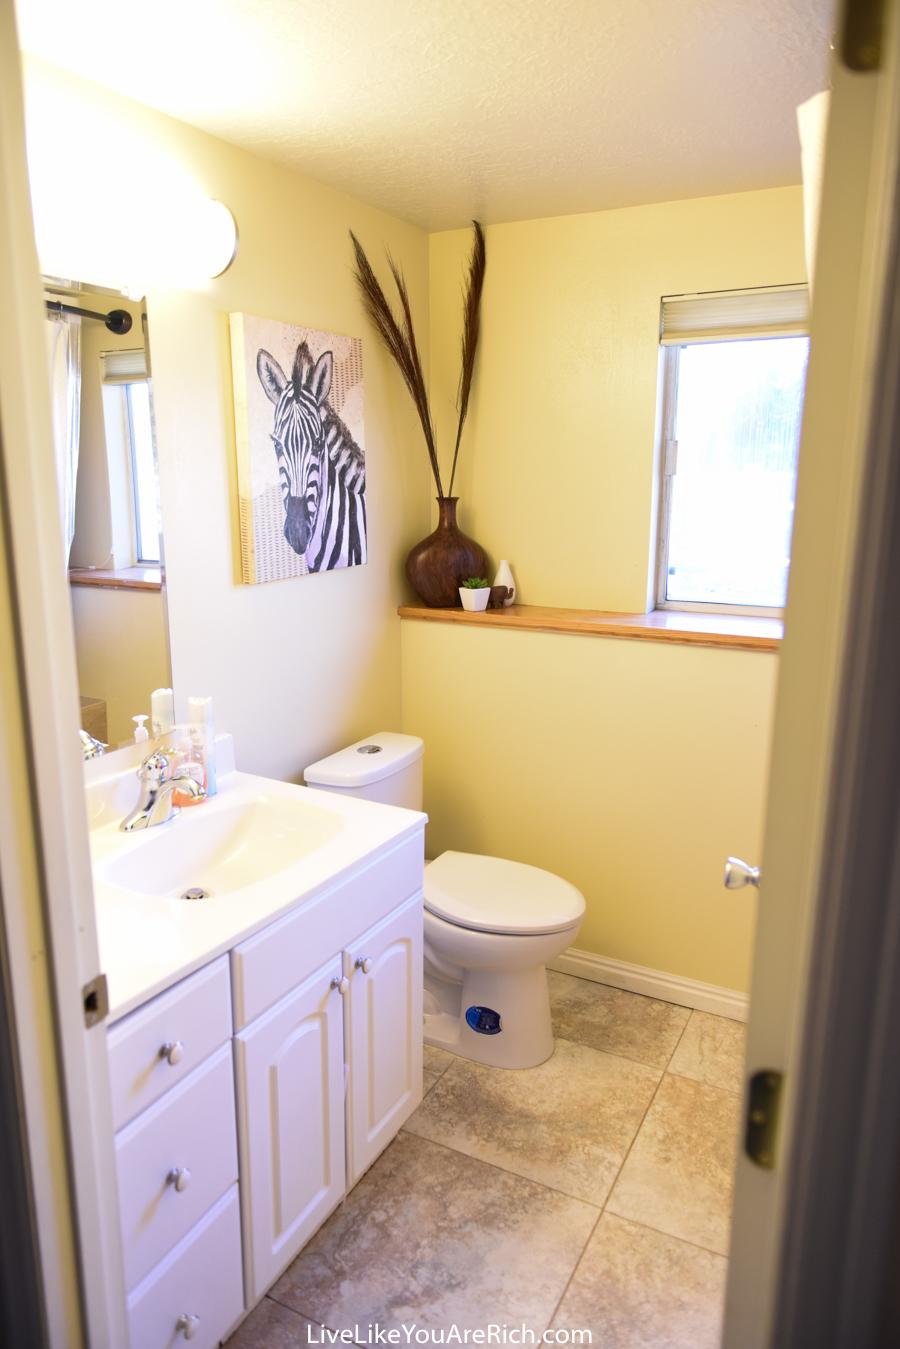 bathroomshowercurtain-2